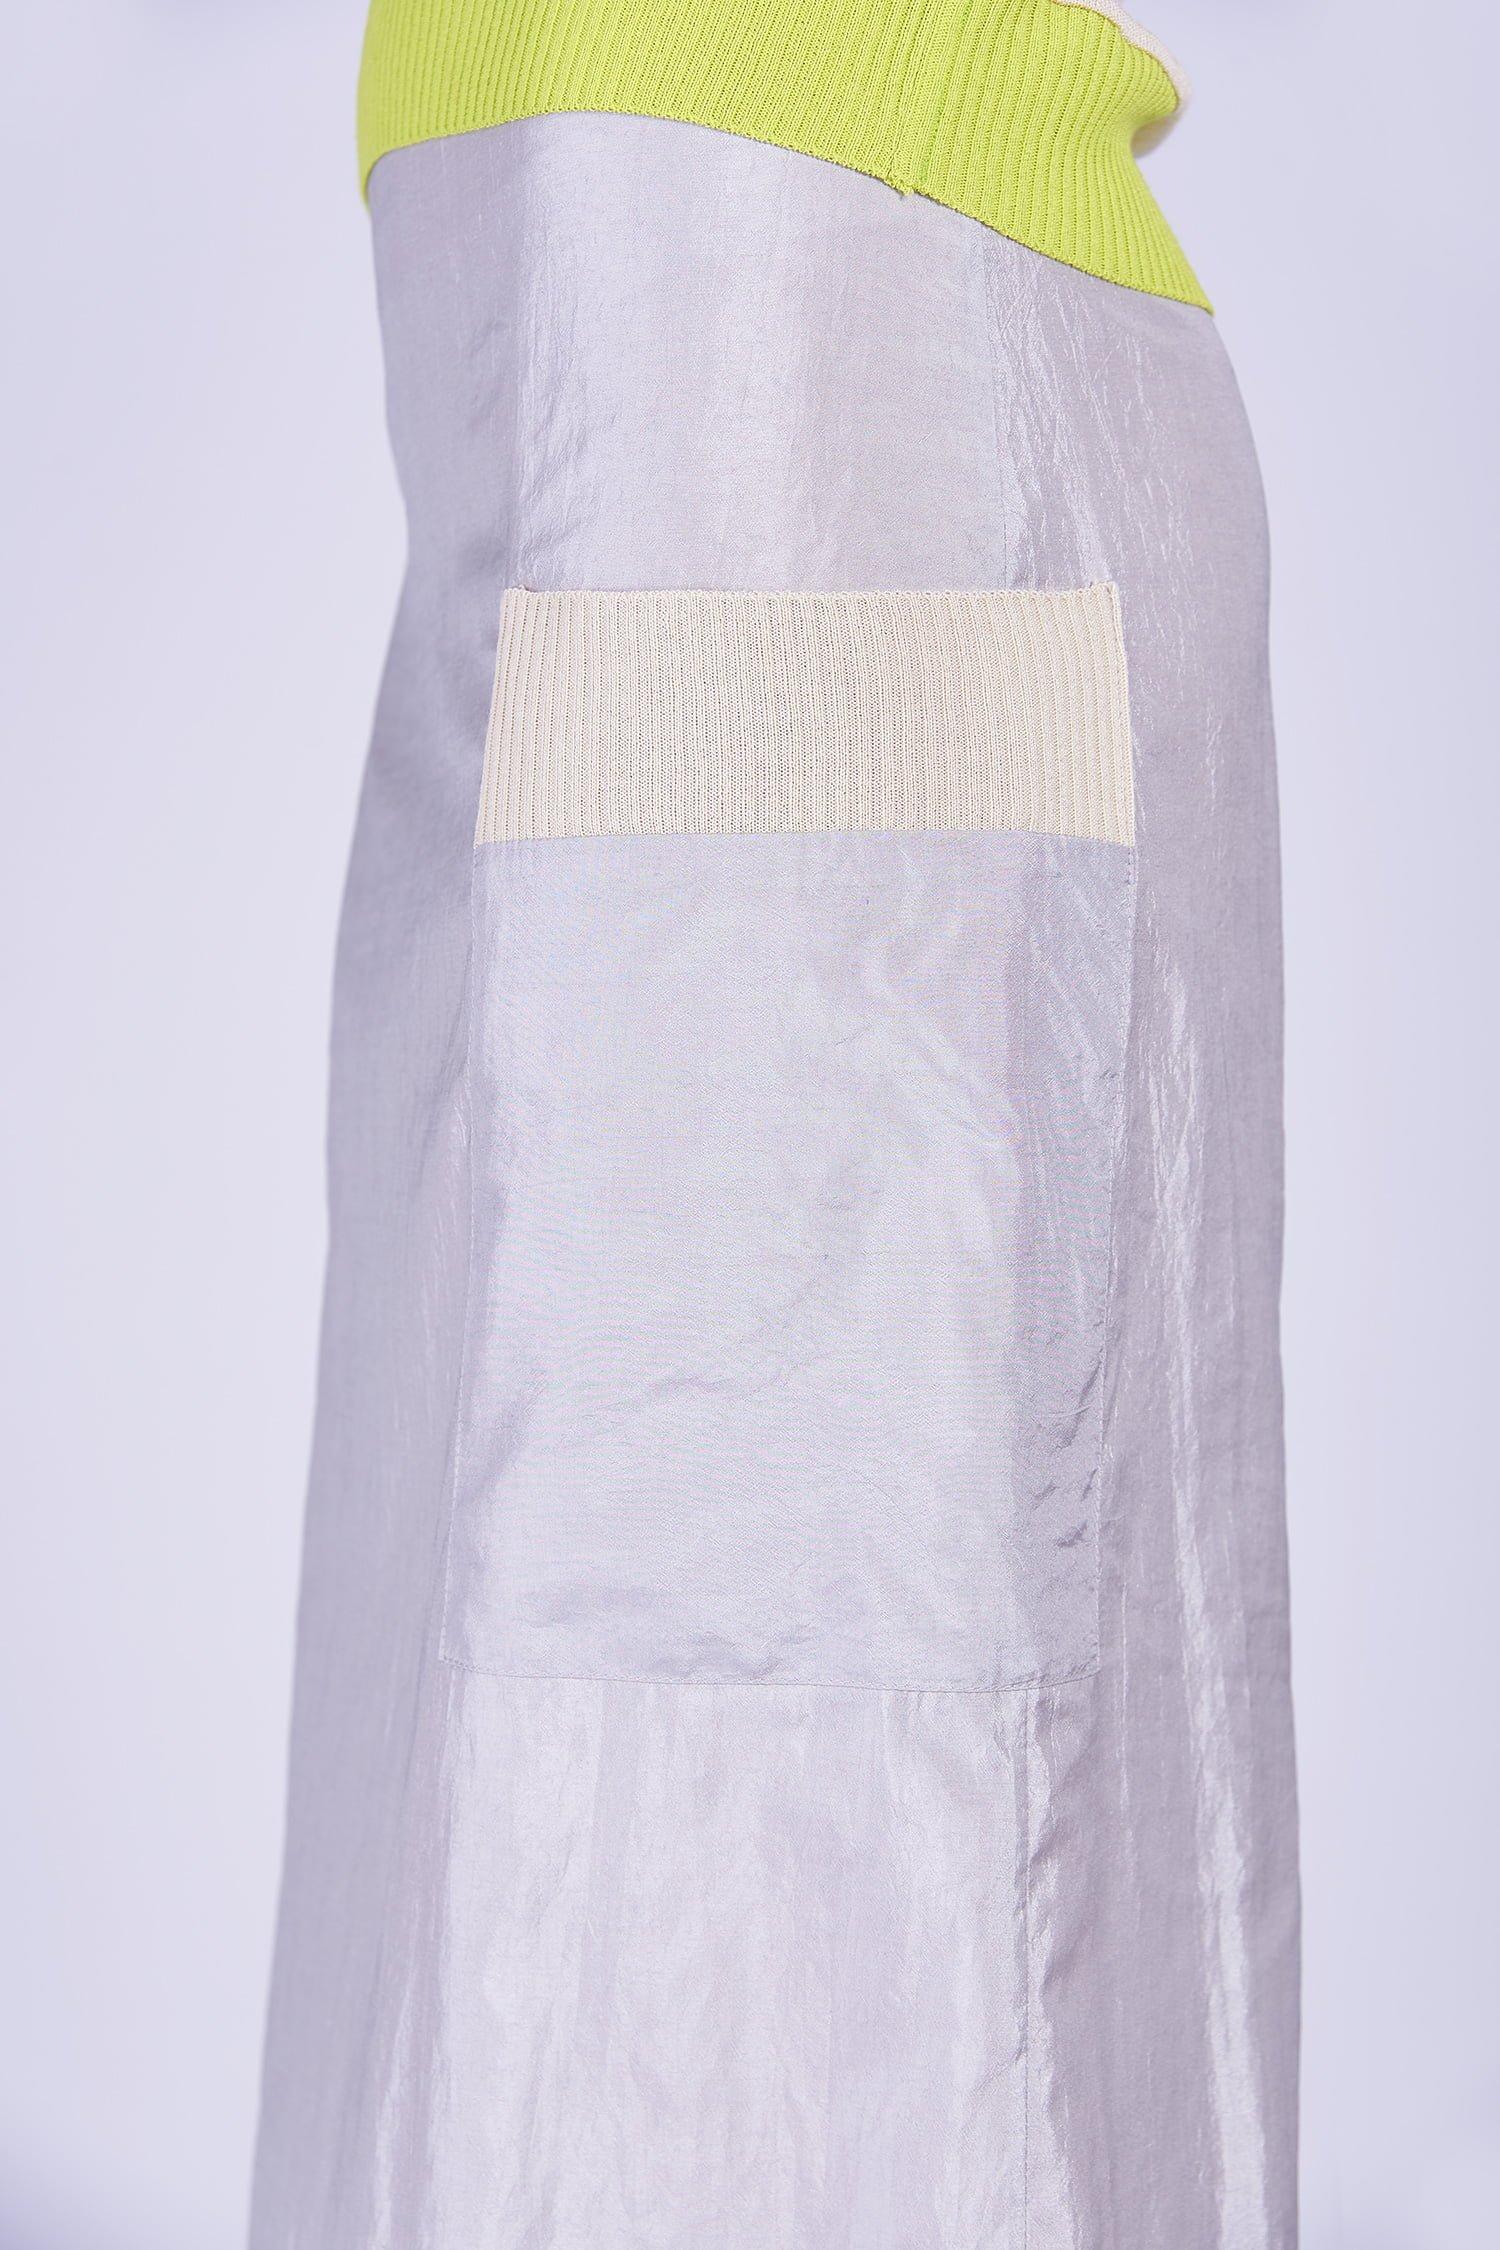 Acephala Ss2020 Silver Bustier Top Midi Skirt Srebrny Gorsetowy Srebrna Spodnica Detail